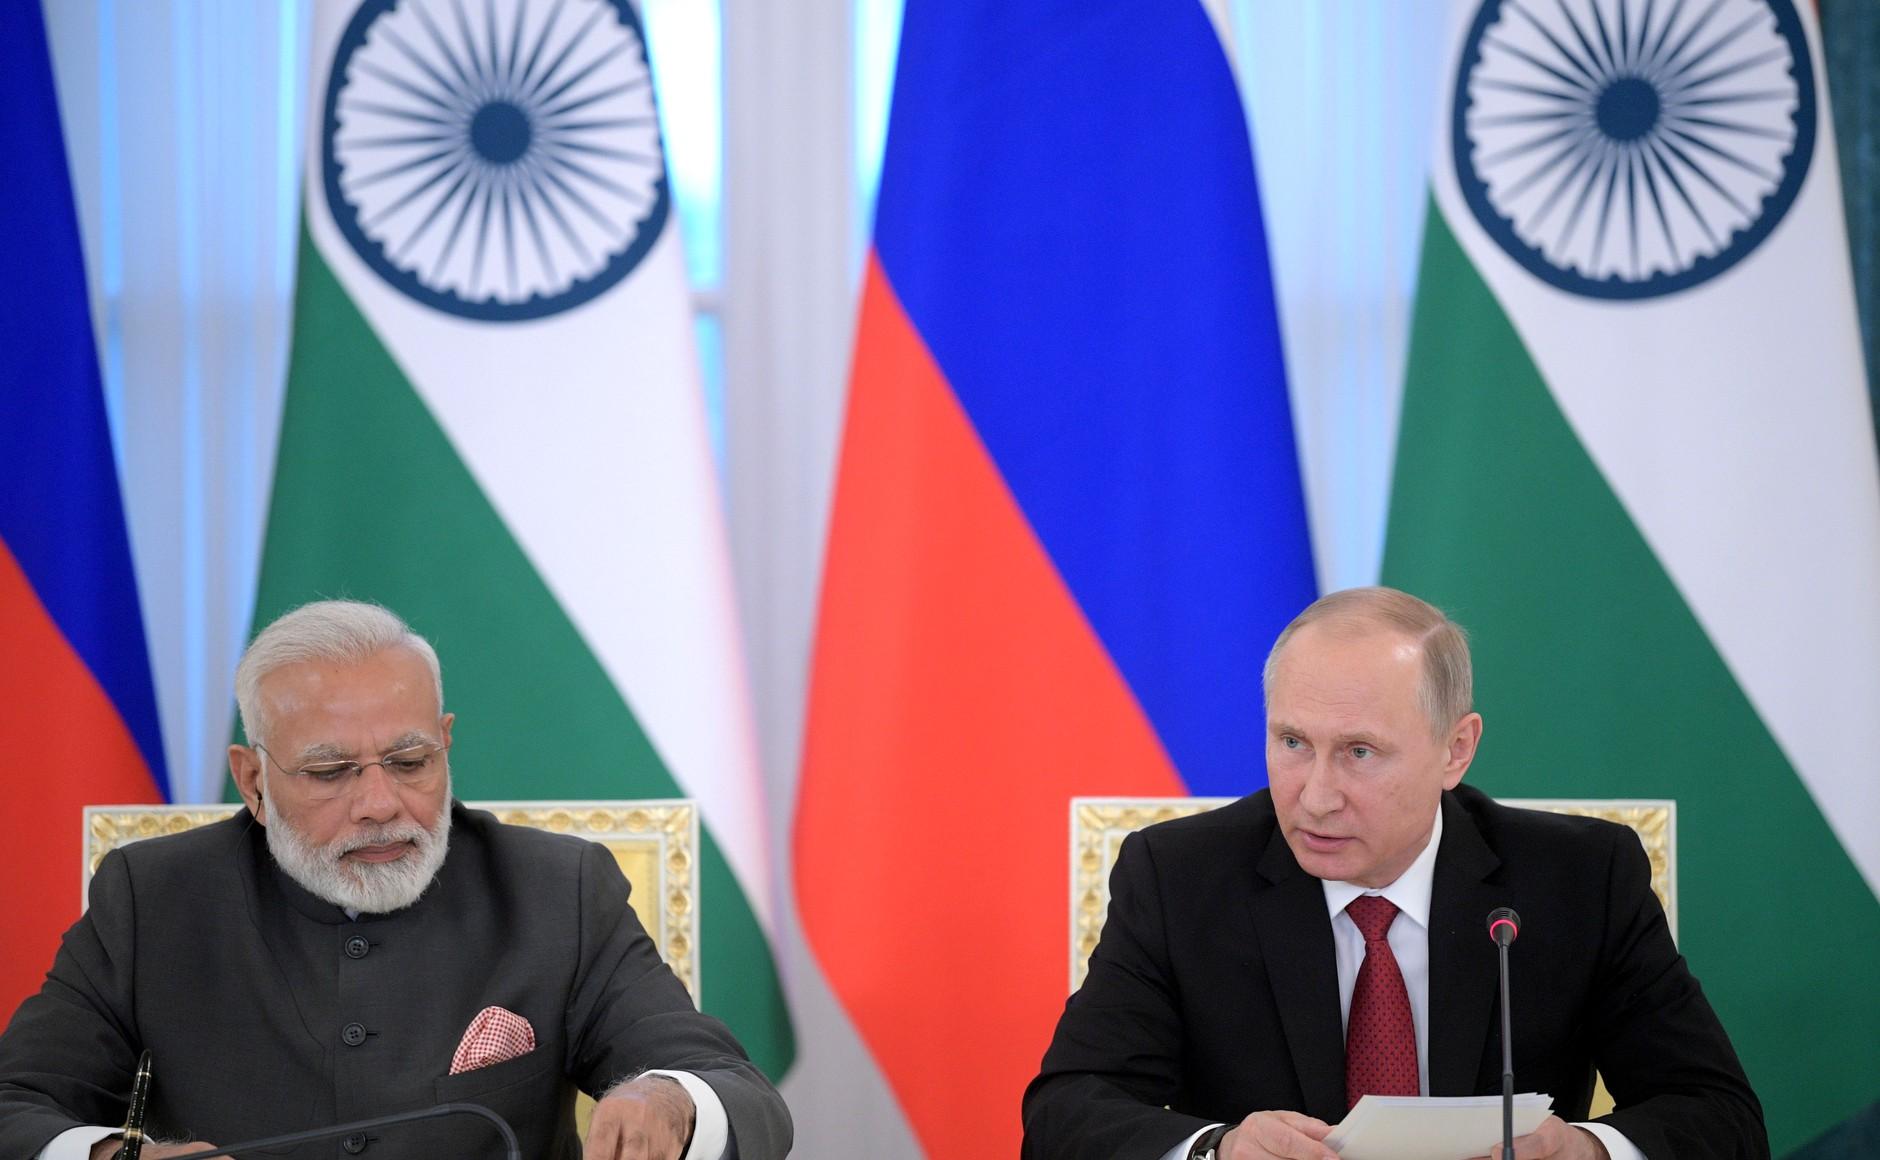 File:Prime Minister Narendra Modi and President Vladimir Putin make statements to the press following Russian-Indian talks in Saint Petersburg, 2017 (2).jpg - Wikimedia Commons